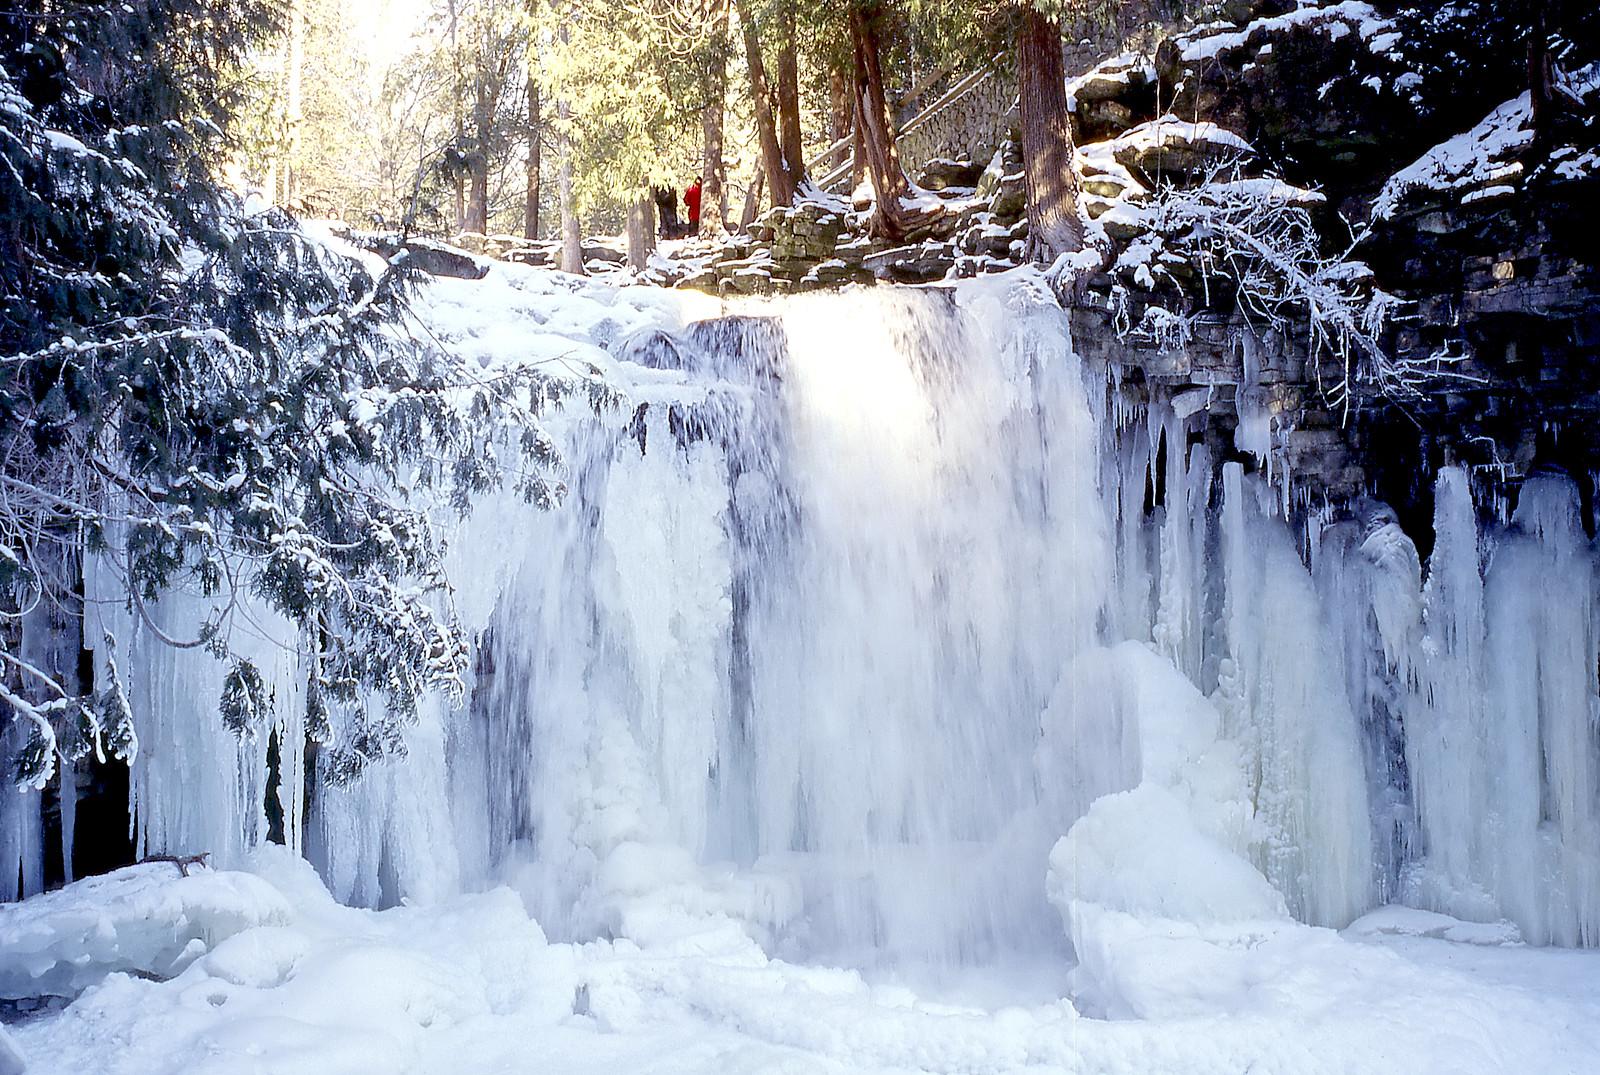 hilton falls - g2 - e100gx - 036